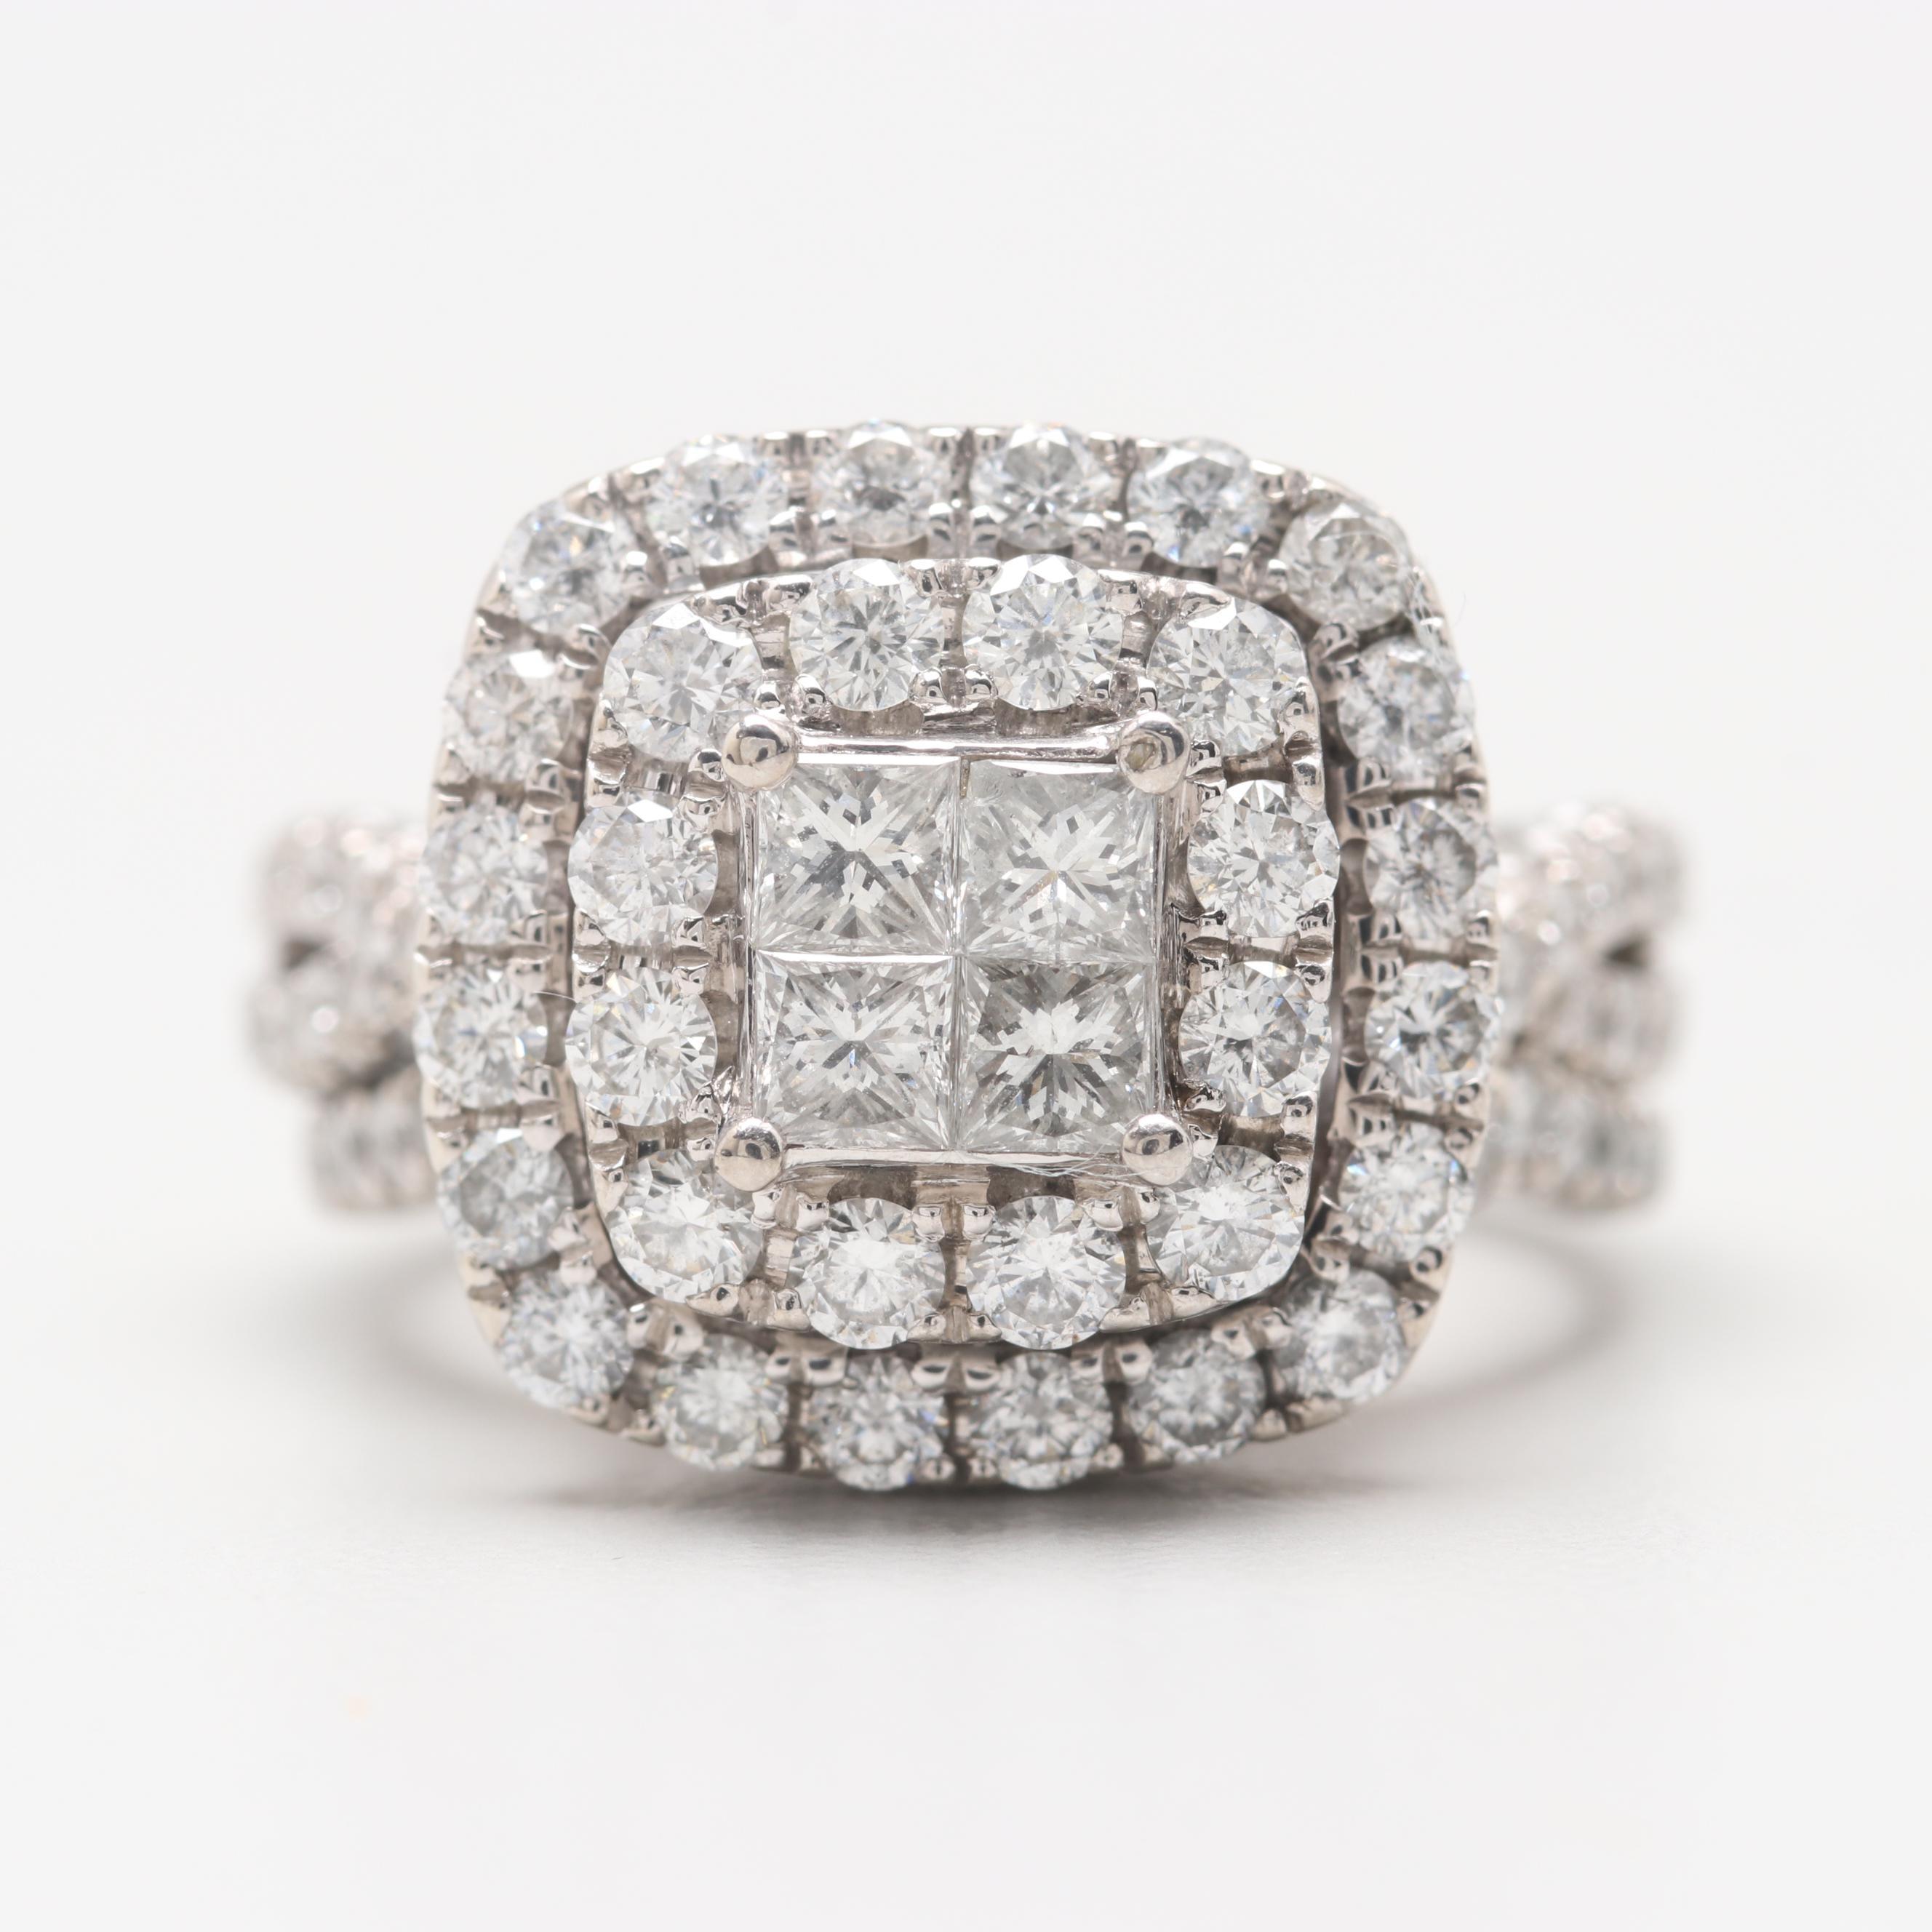 Neil Lane 14K White Gold 3.57 CTW Diamond Bridal Set